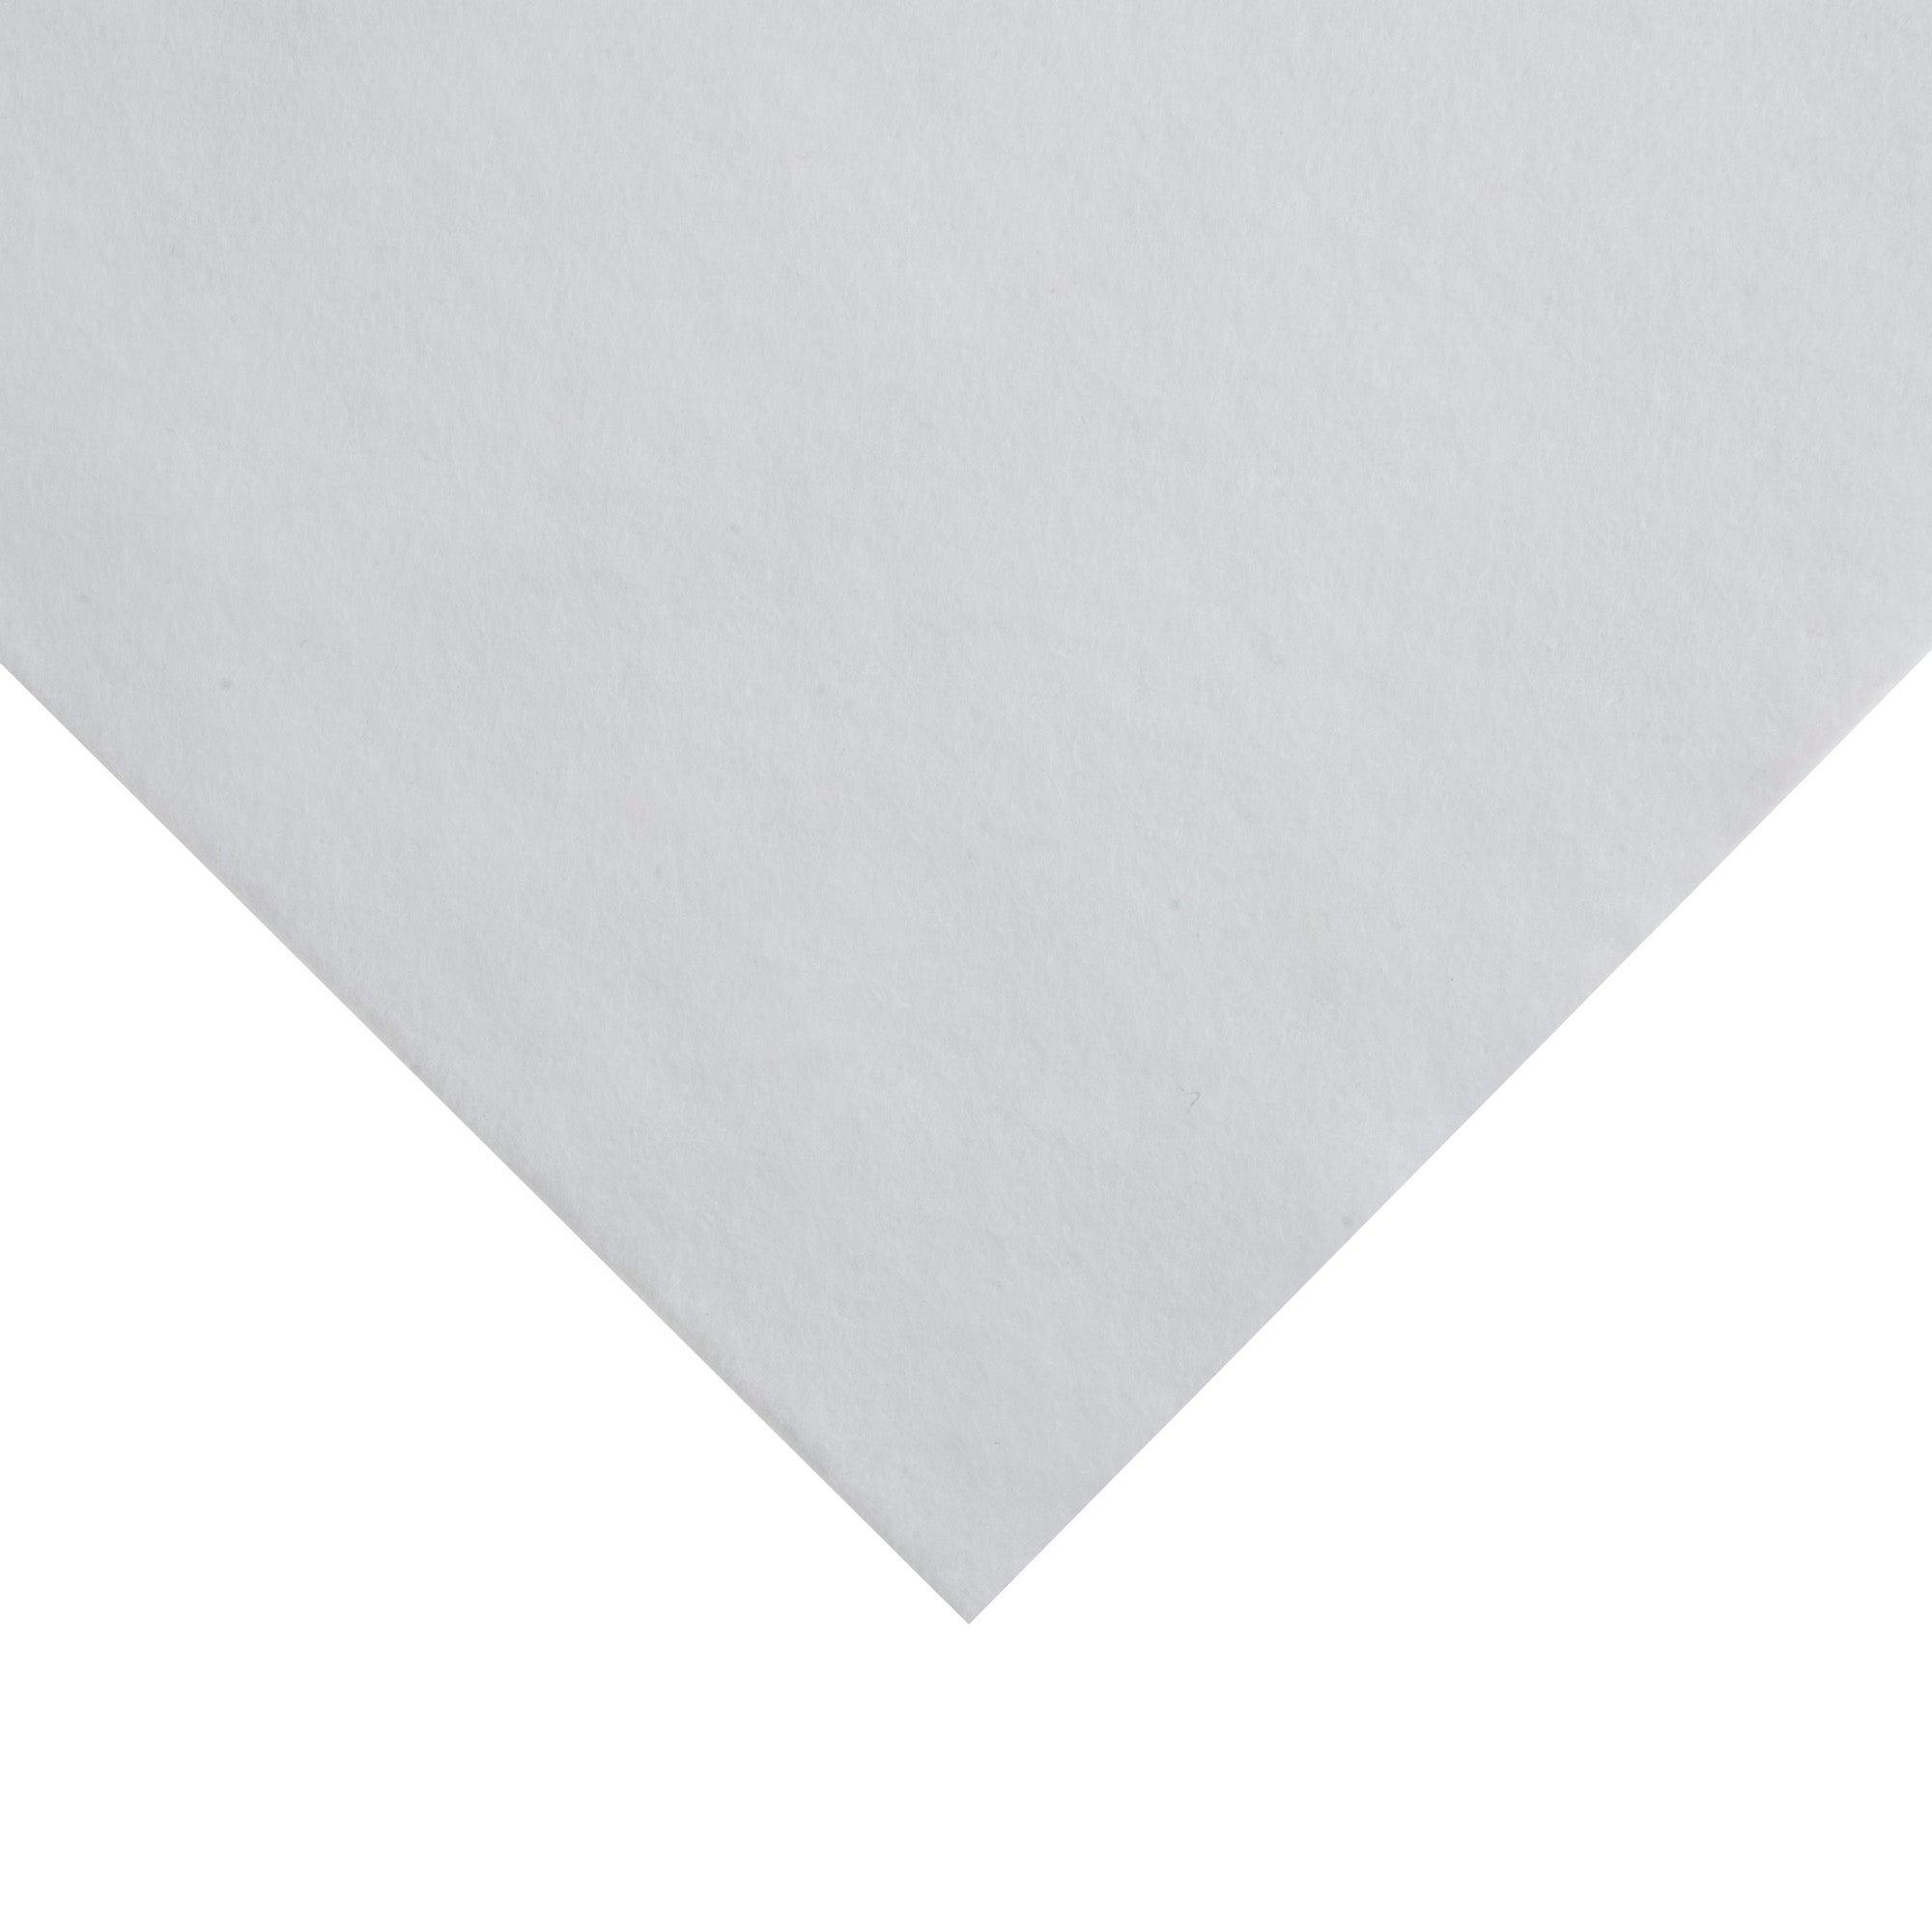 Photo of Minicraft felt roll white